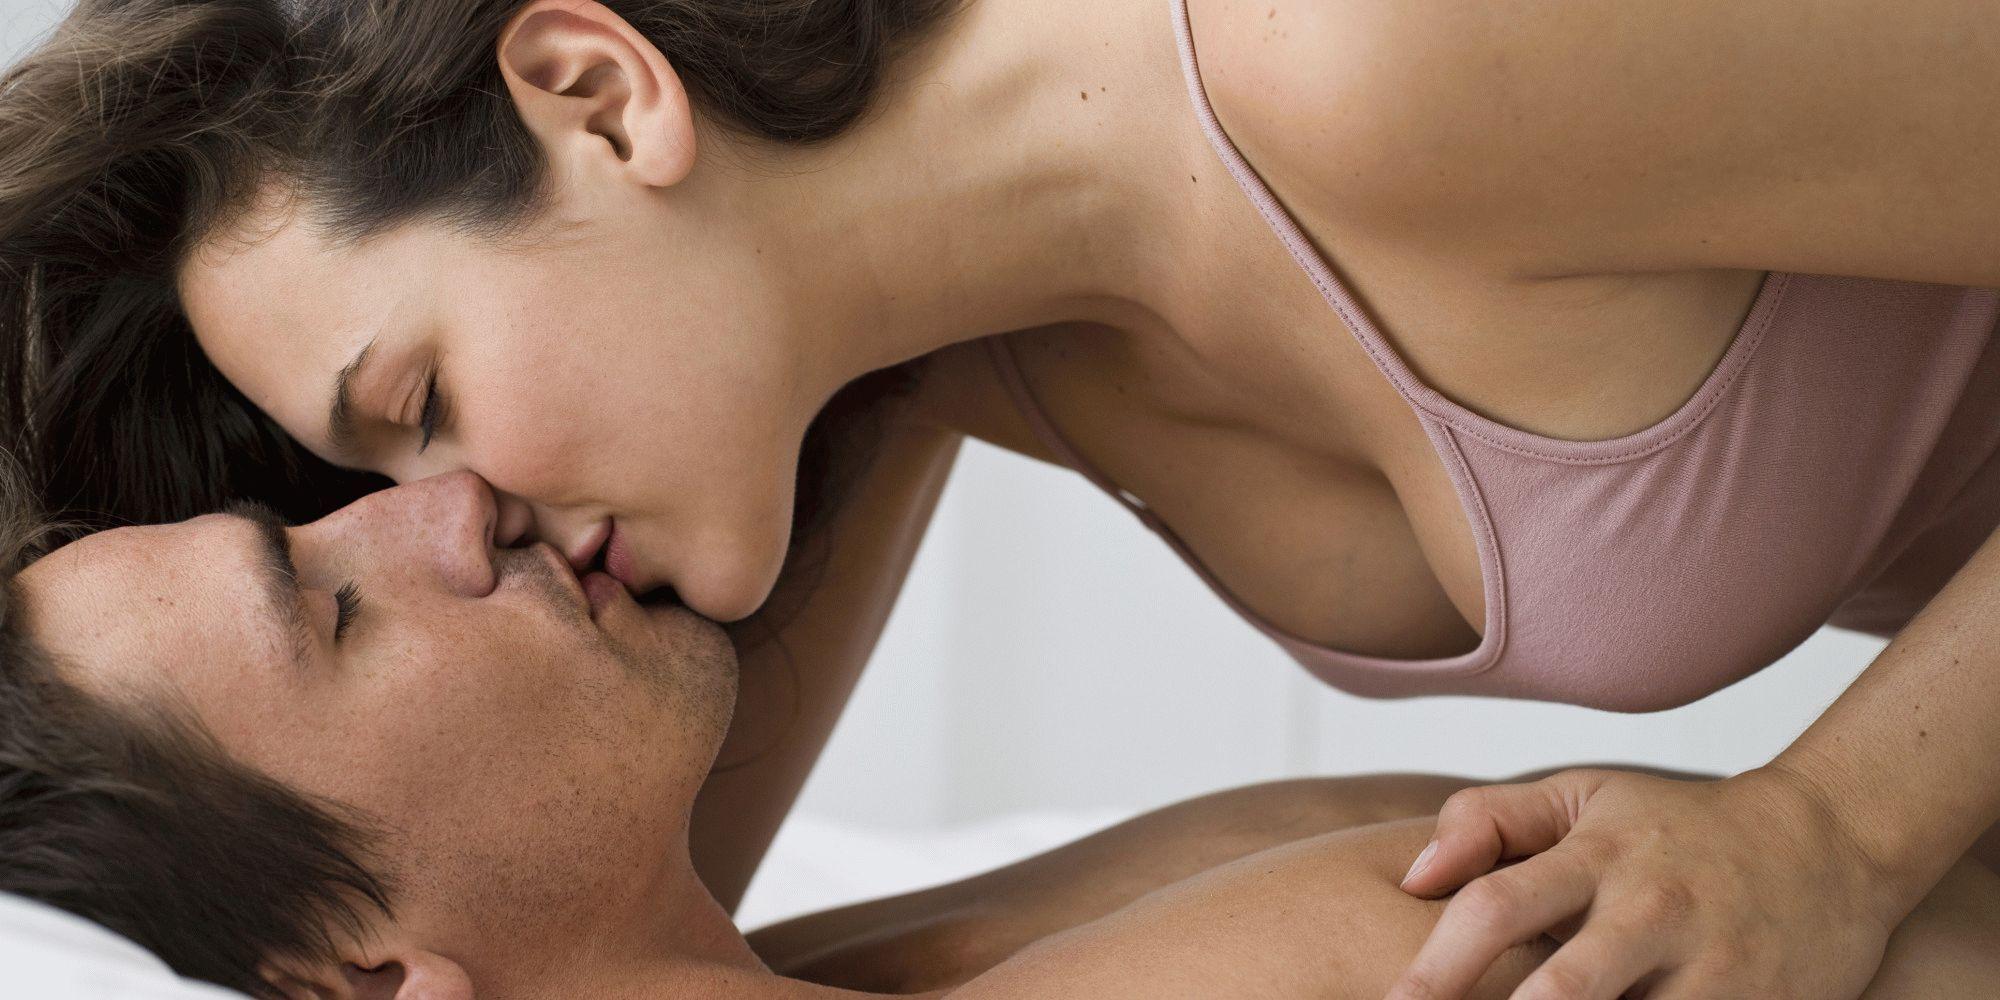 Оргазм вреден или нет для мужчин